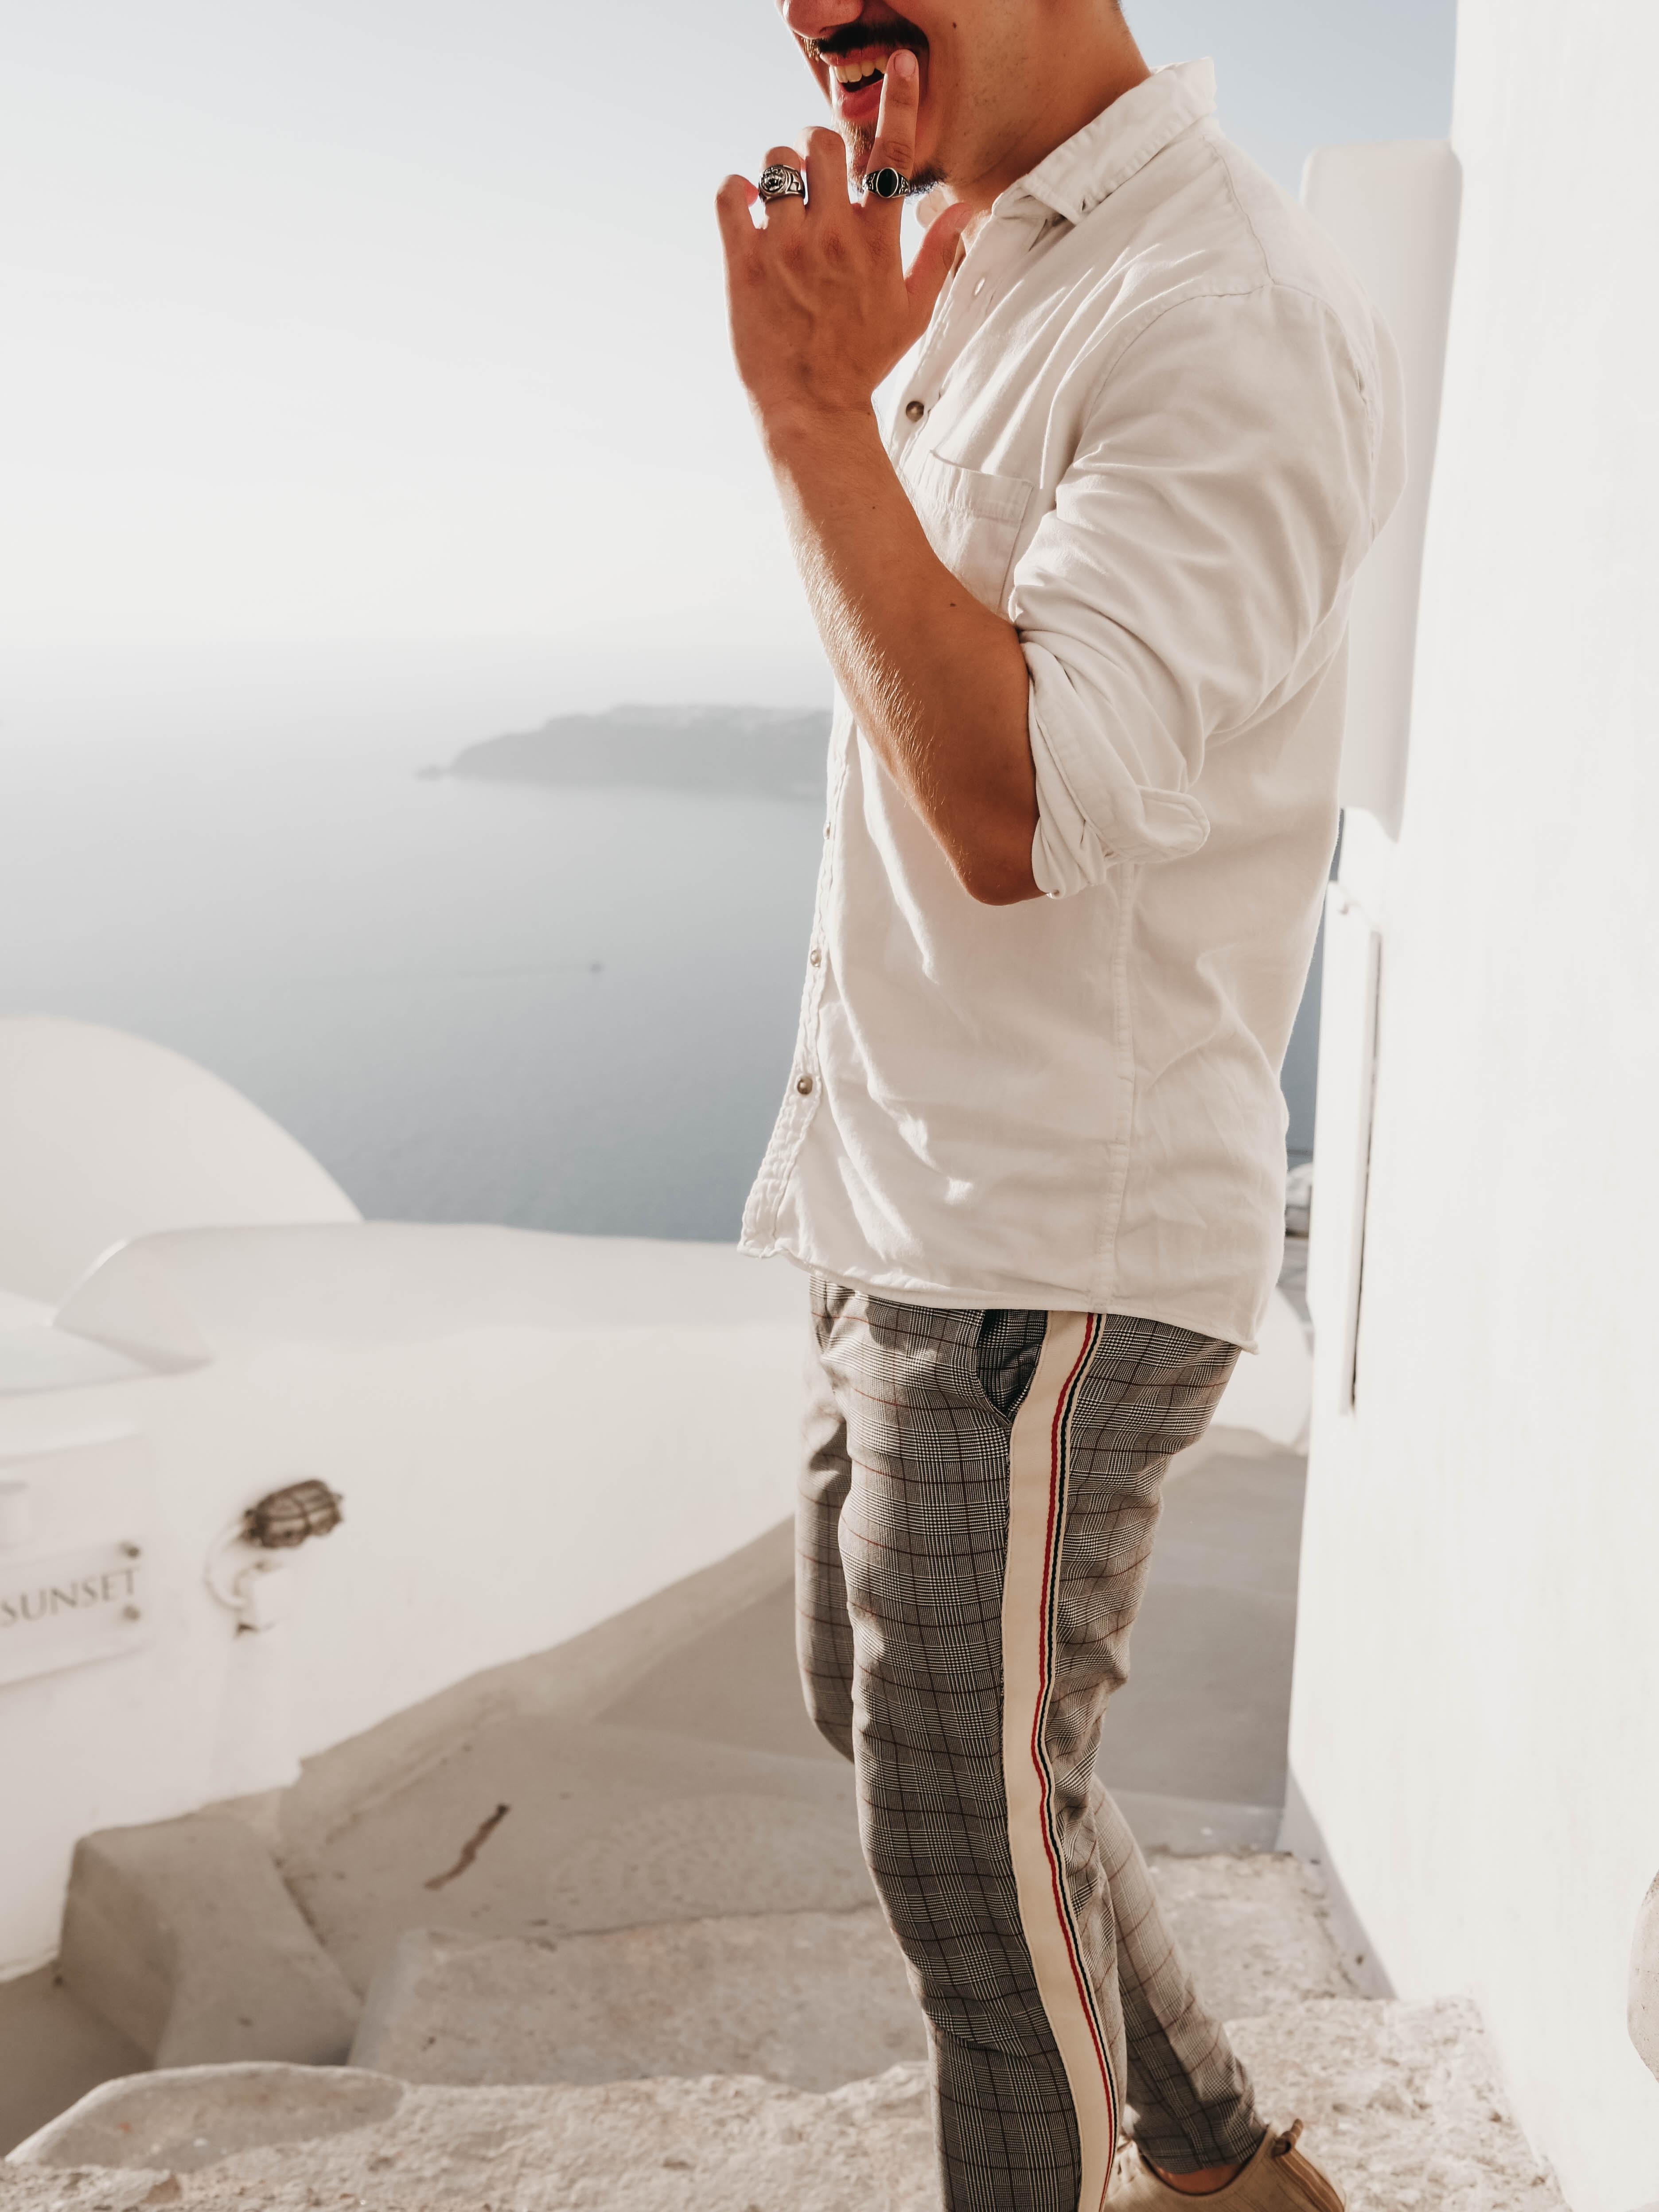 man wearing white dress shirt and gray pants